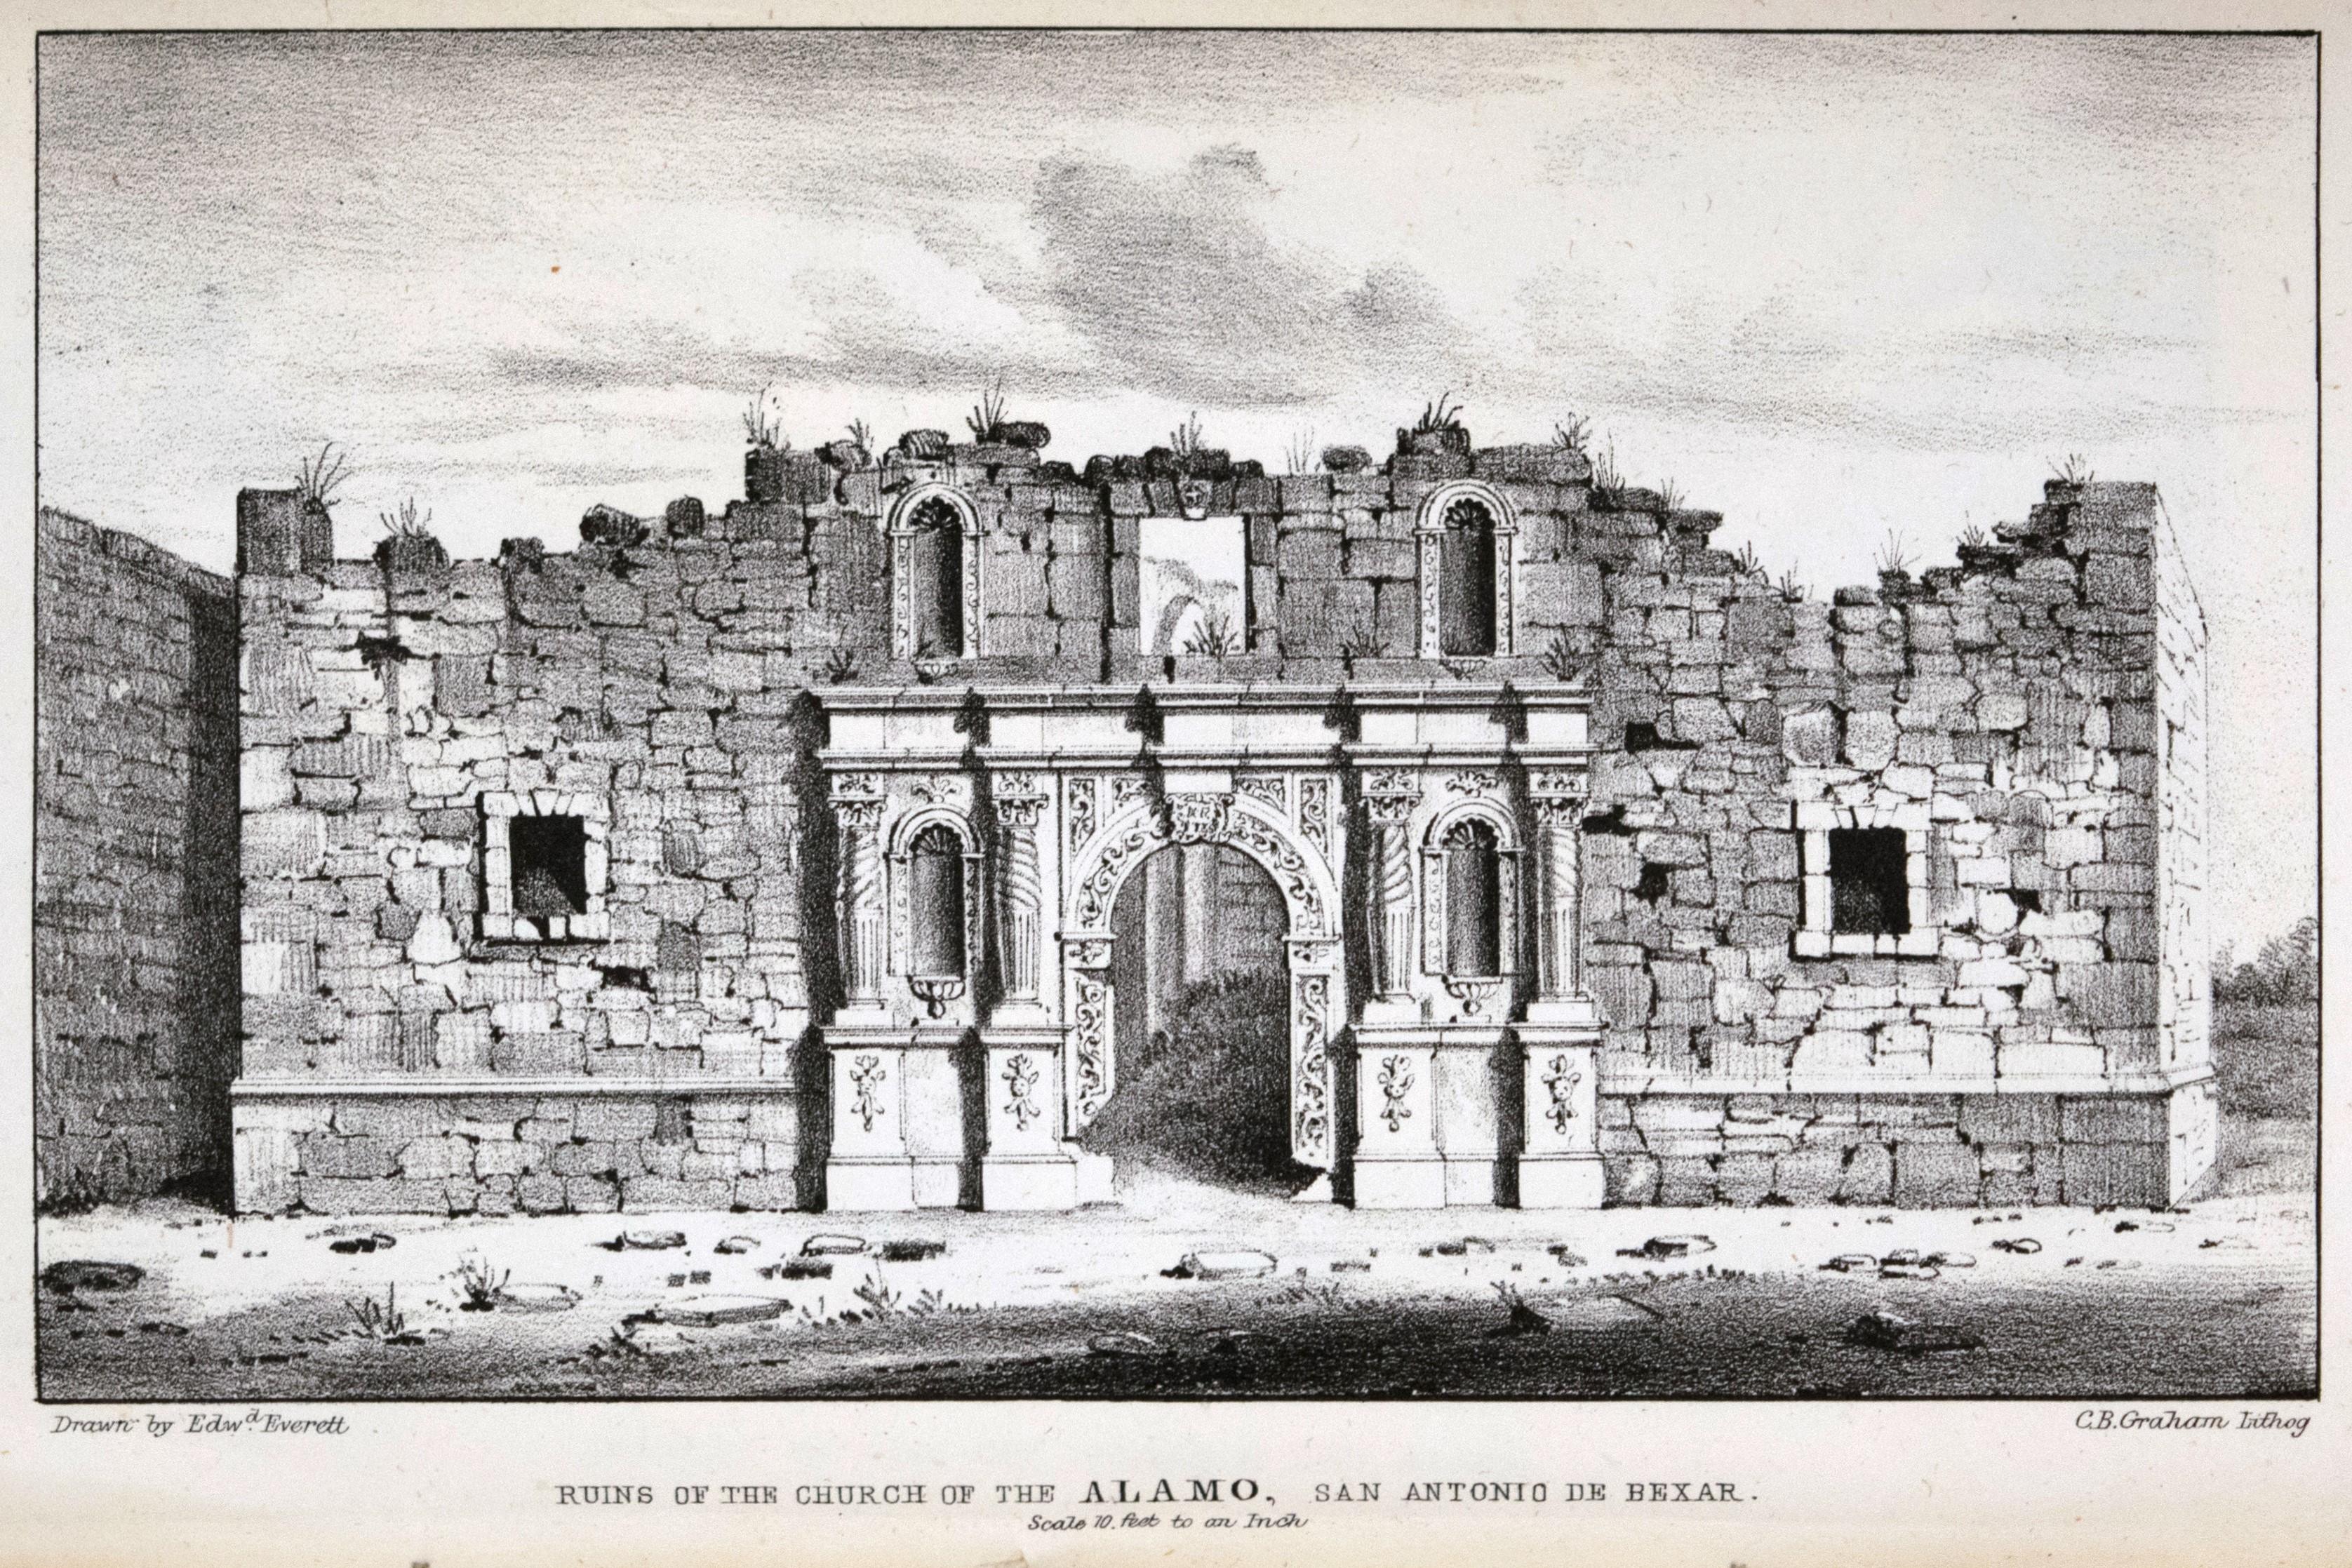 Powell Library / Memoir / Ruins of the Church of the Alamo